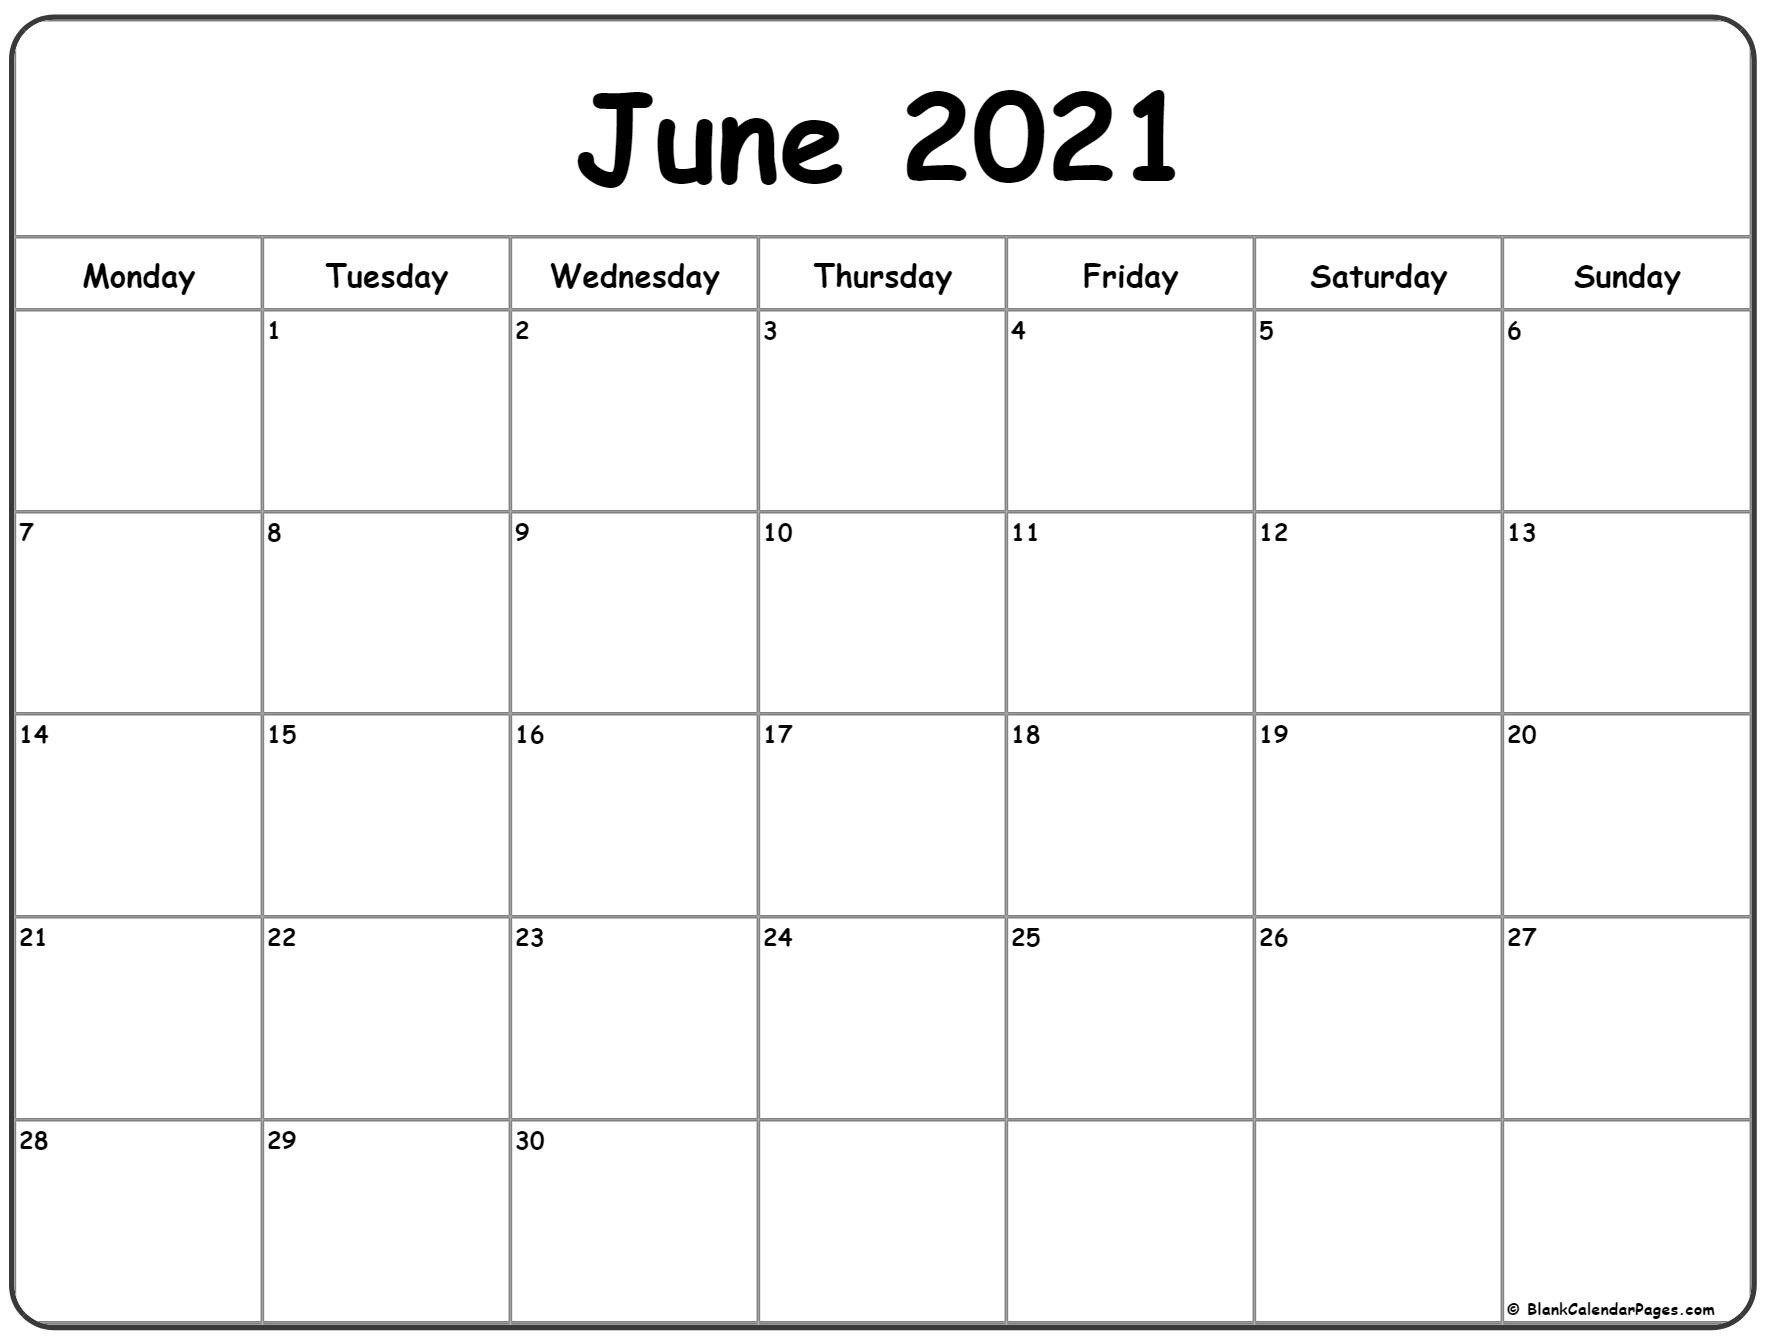 June 2021 Calendar List Template   Calendar Template Printable June 2021 Blank Calendar Printable